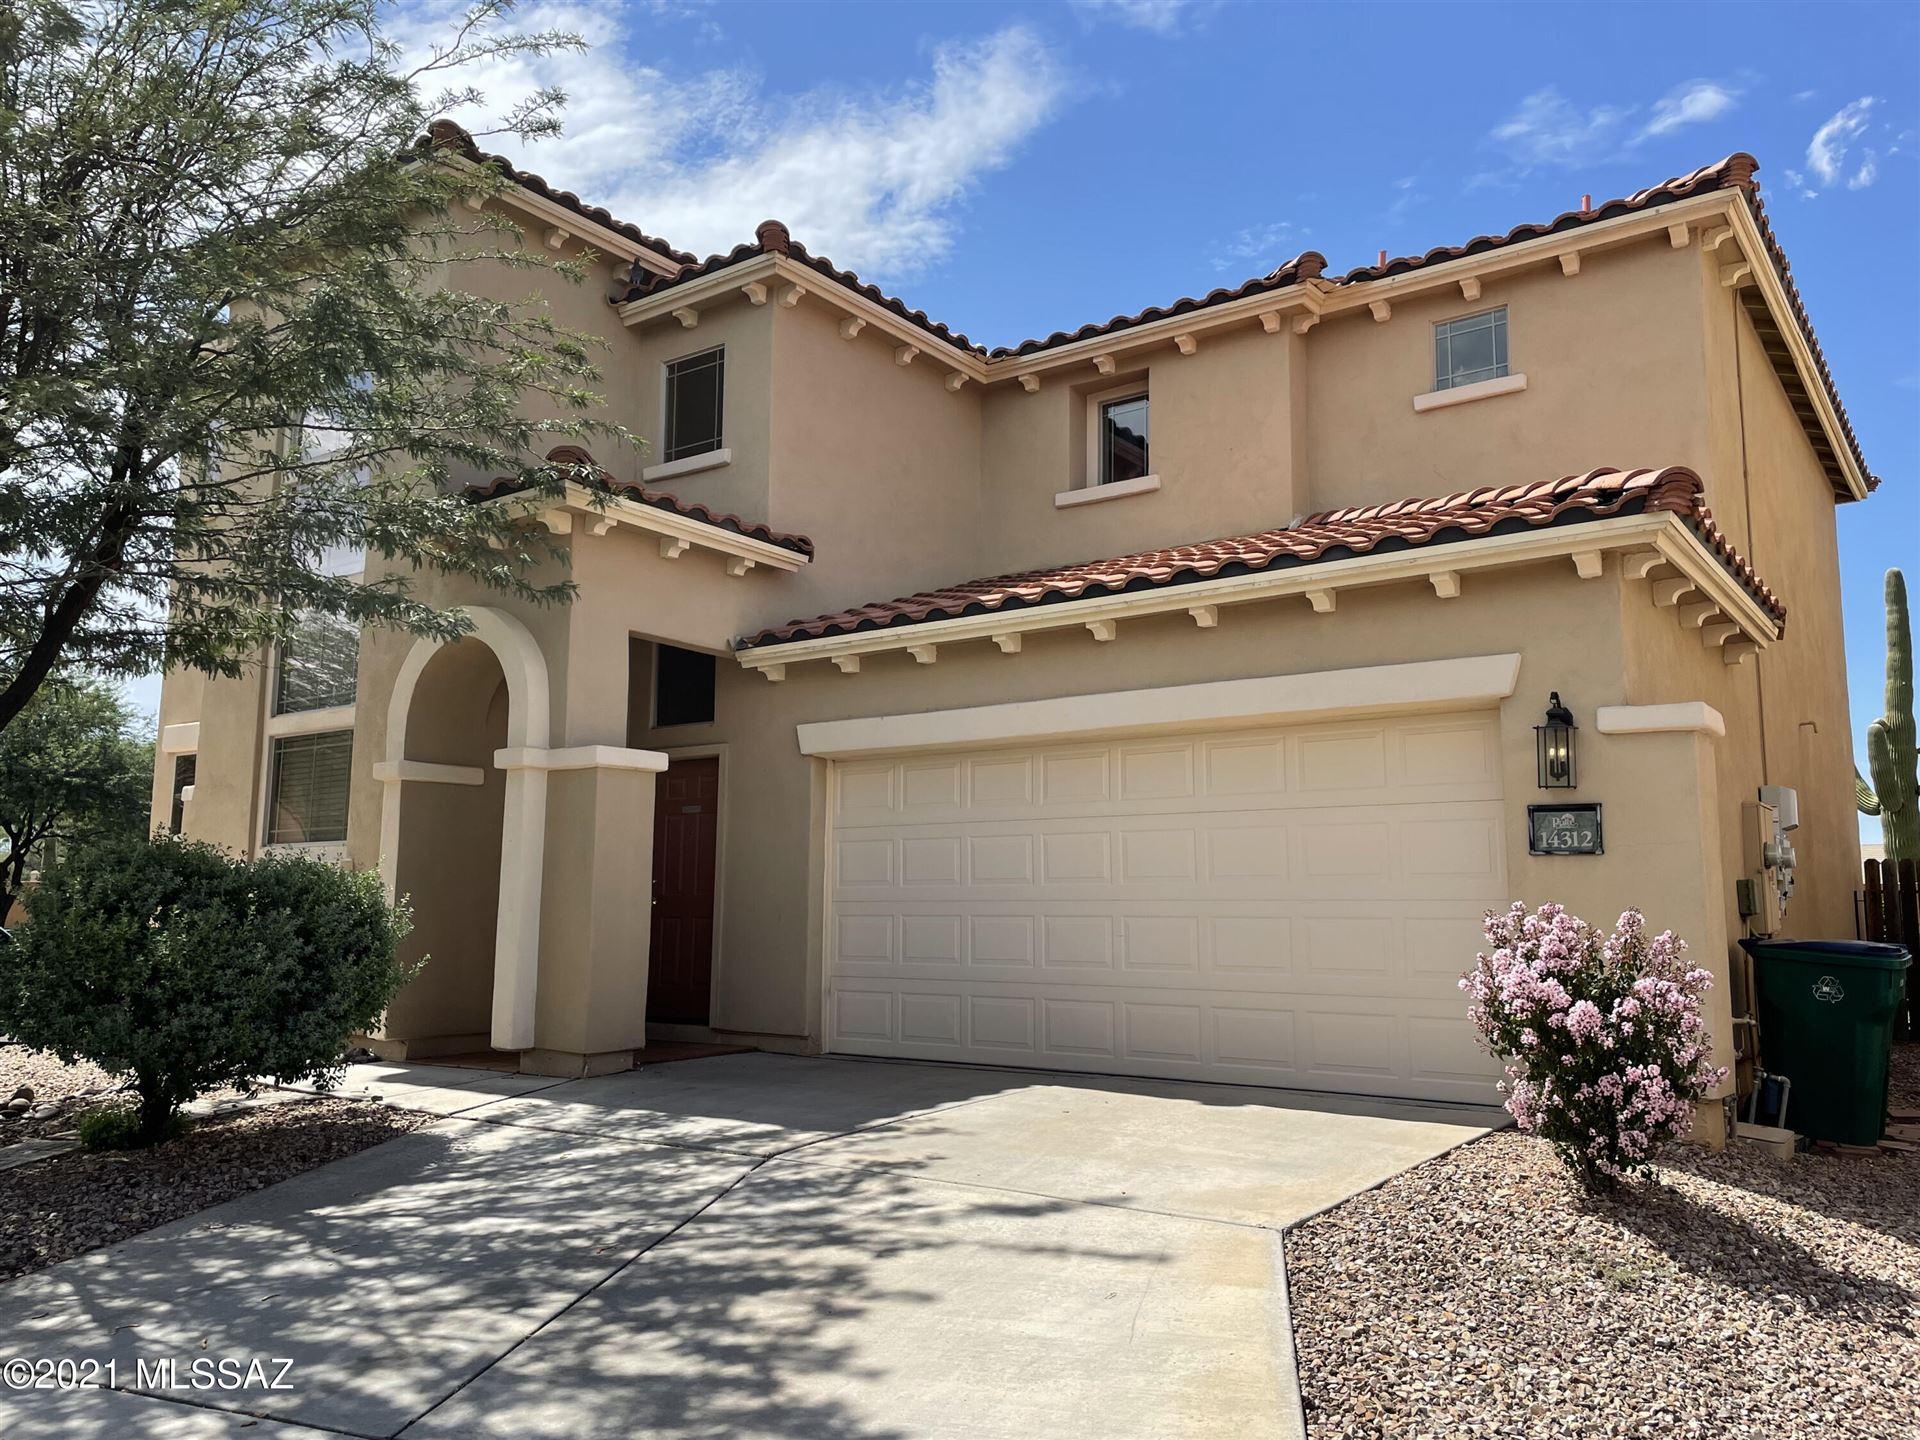 14312 S Avenida Zumba, Sahuarita, AZ 85629 - MLS#: 22122448